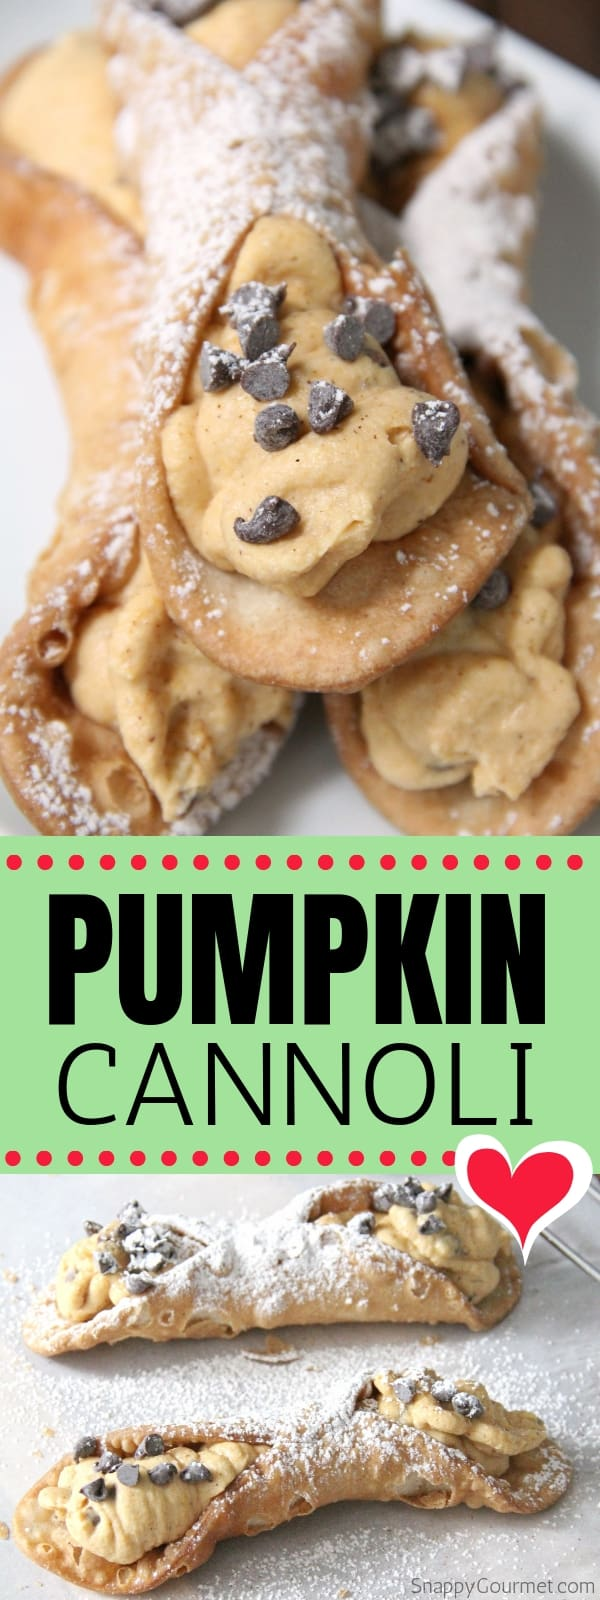 pumpkin cannoli collage